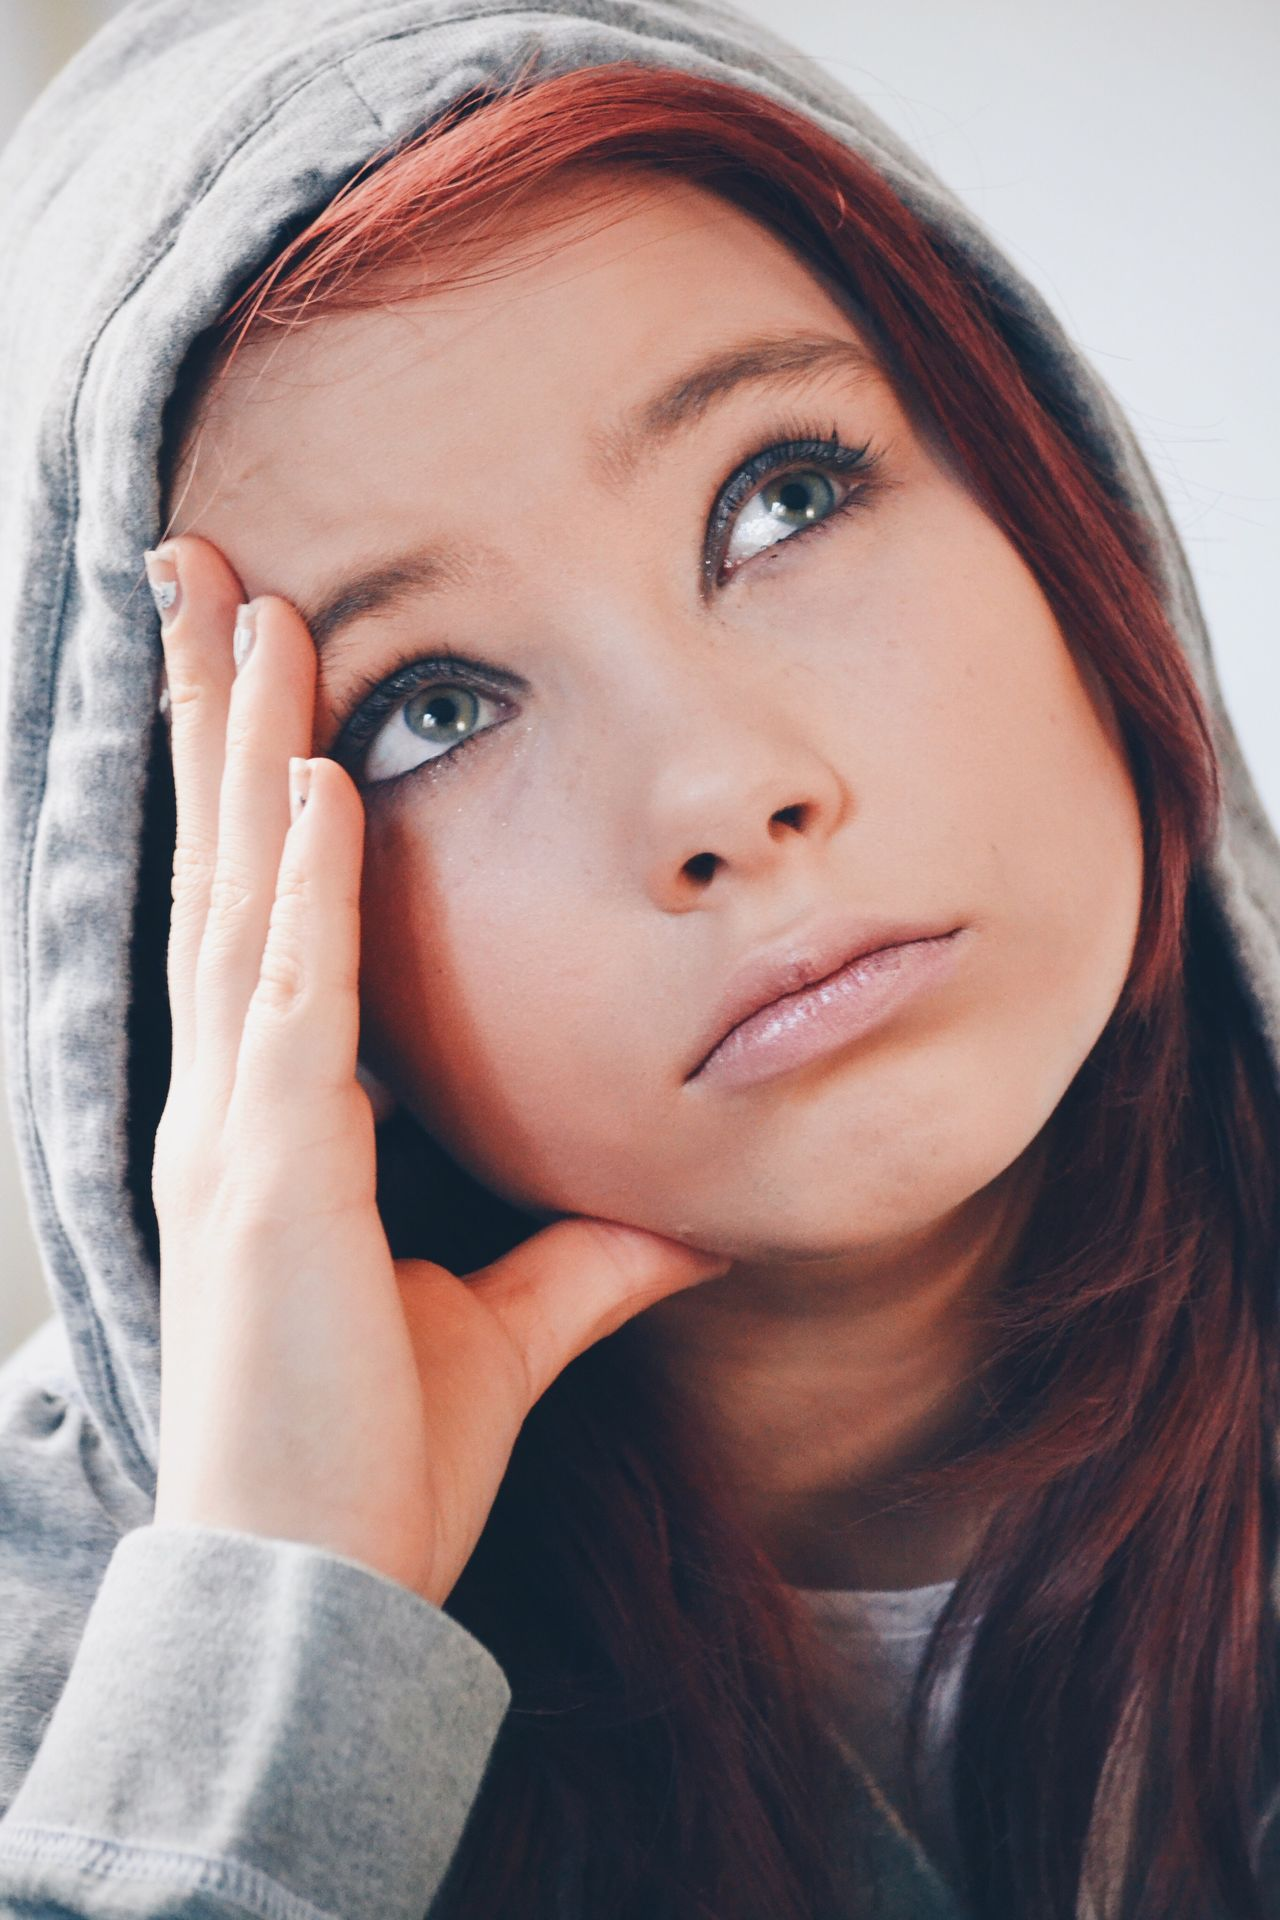 The Portraitist - 2016 EyeEm Awards Anxious  Anxiety  Sad Sadness Expression Facial Portrait People Stress Headache Wondering Thinking